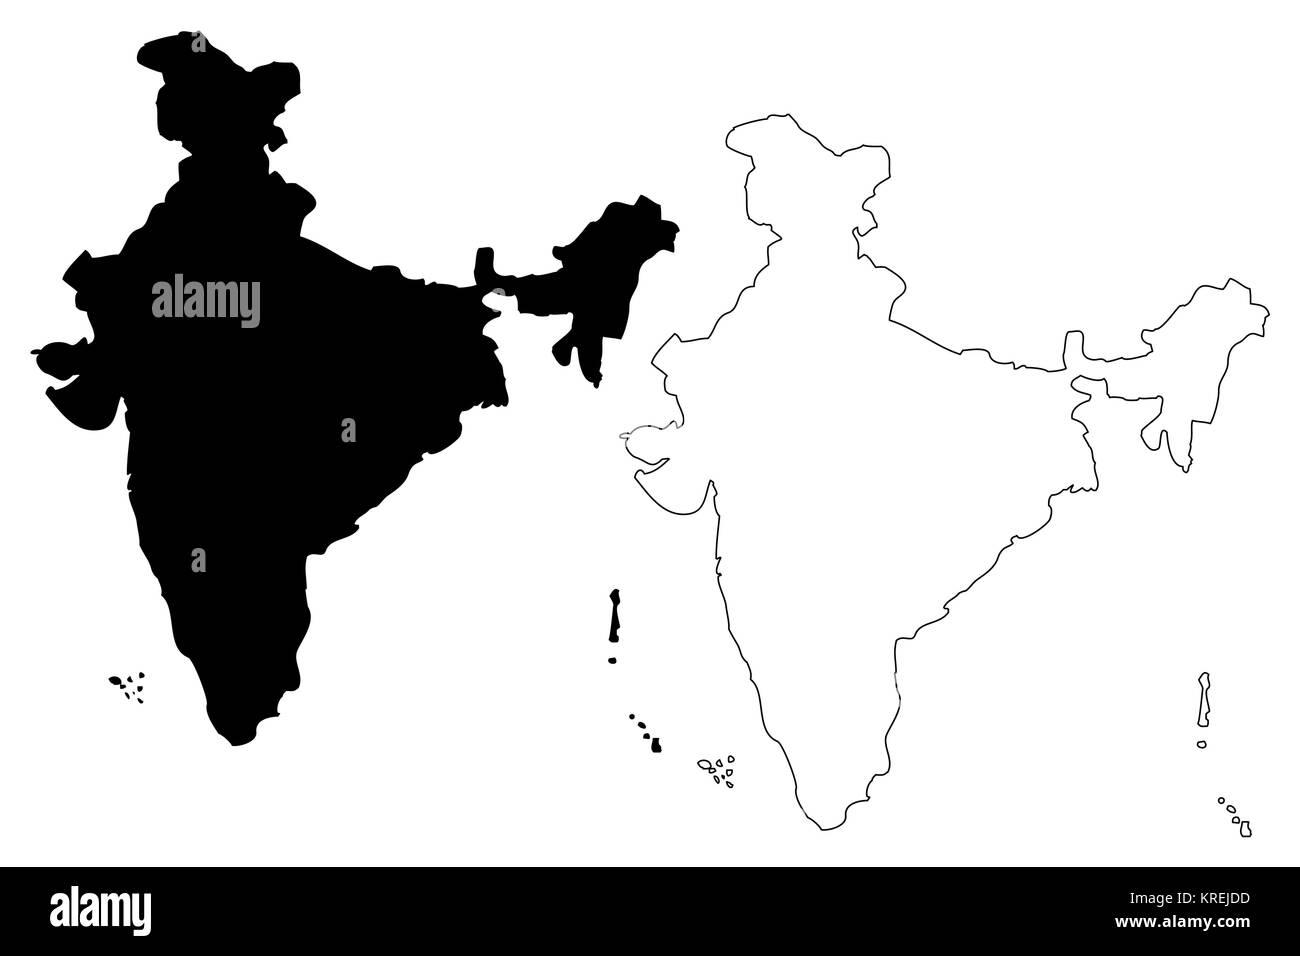 India map vector illustration, scribble sketch Republic of India - Stock Vector